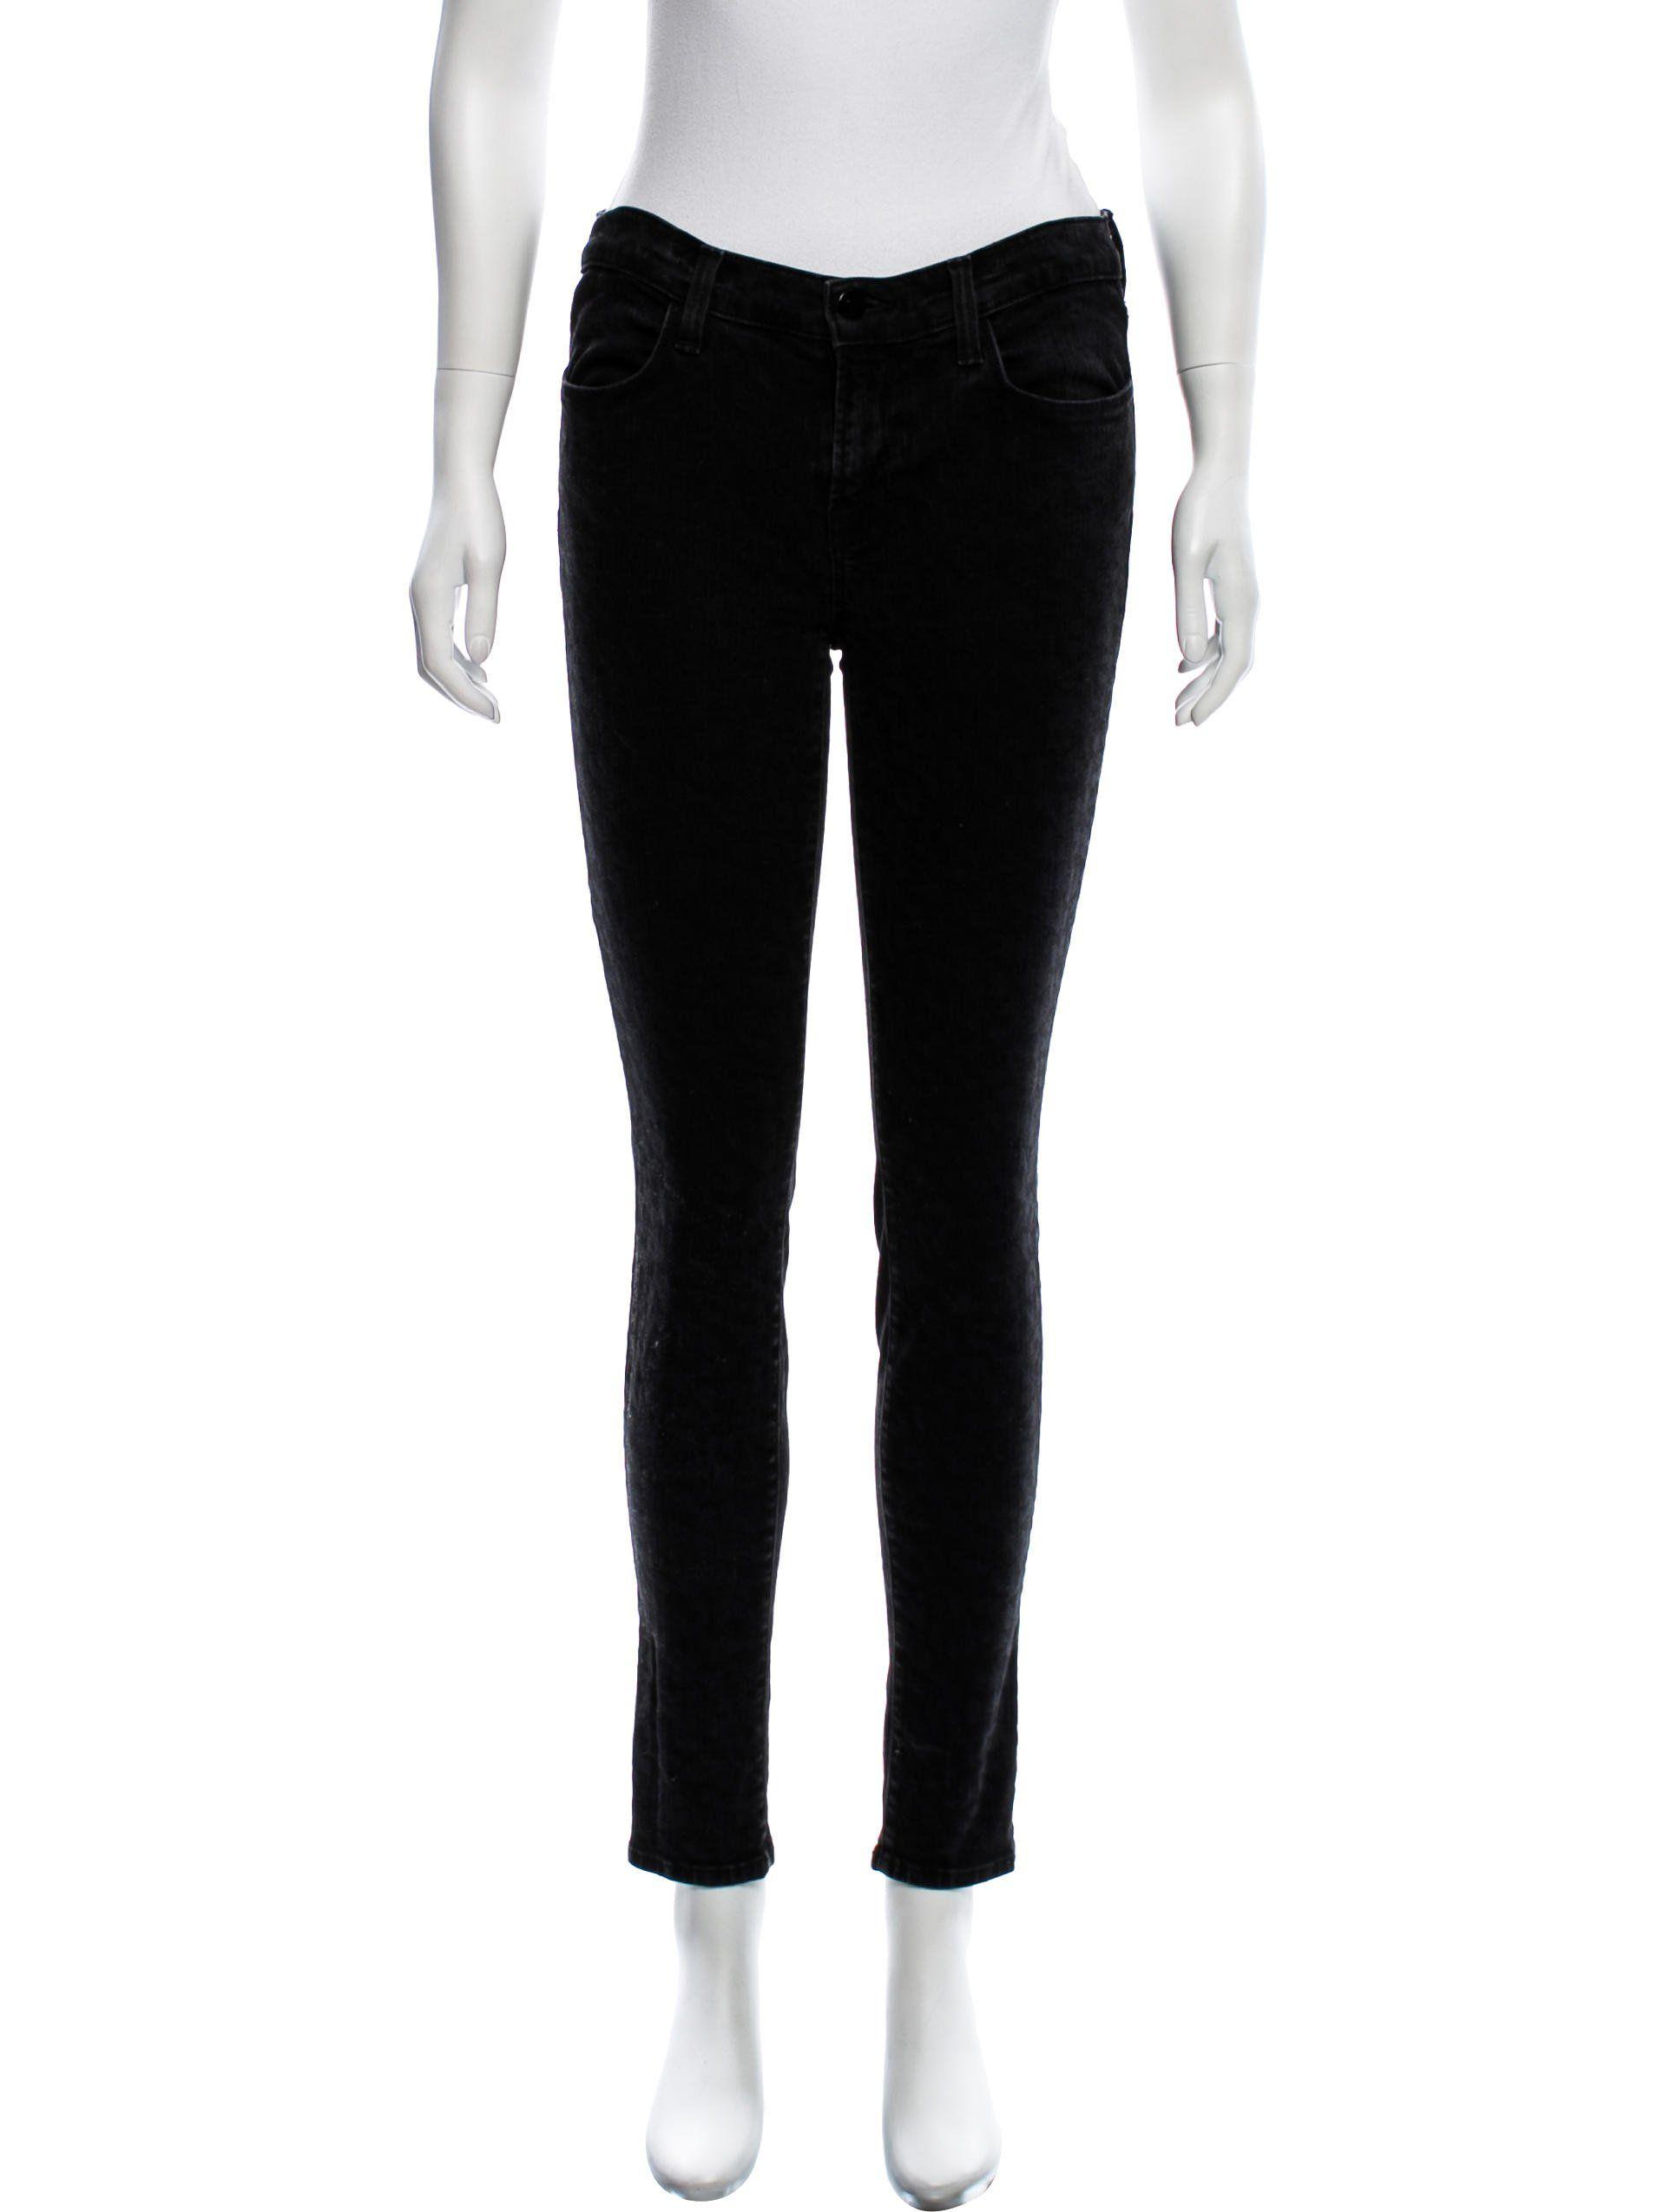 J brand green velvet dress  Black J Brand midrise skinny jeans with four pockets concealed zip